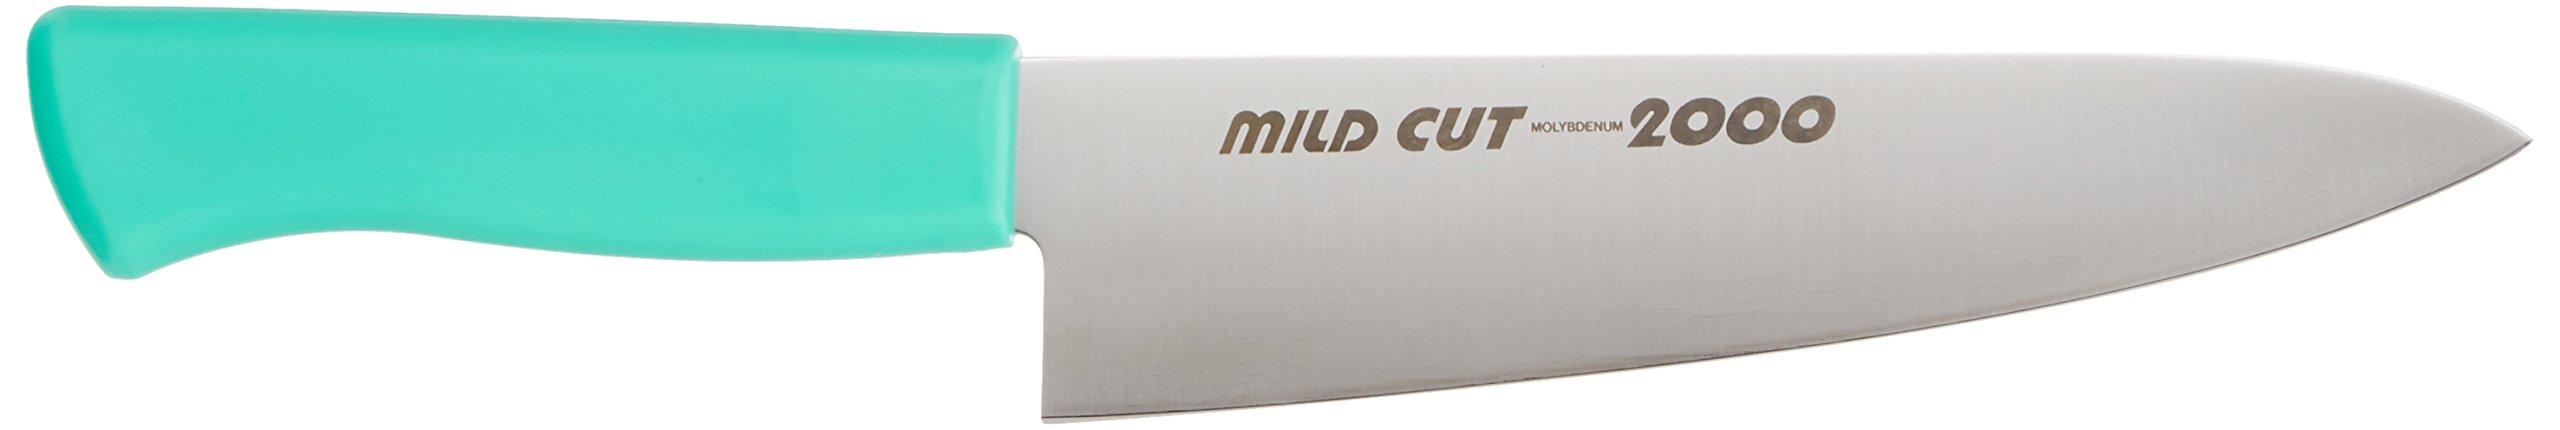 EBM MILD CUT-2000 color knife Gyuto MCG 18cm Green